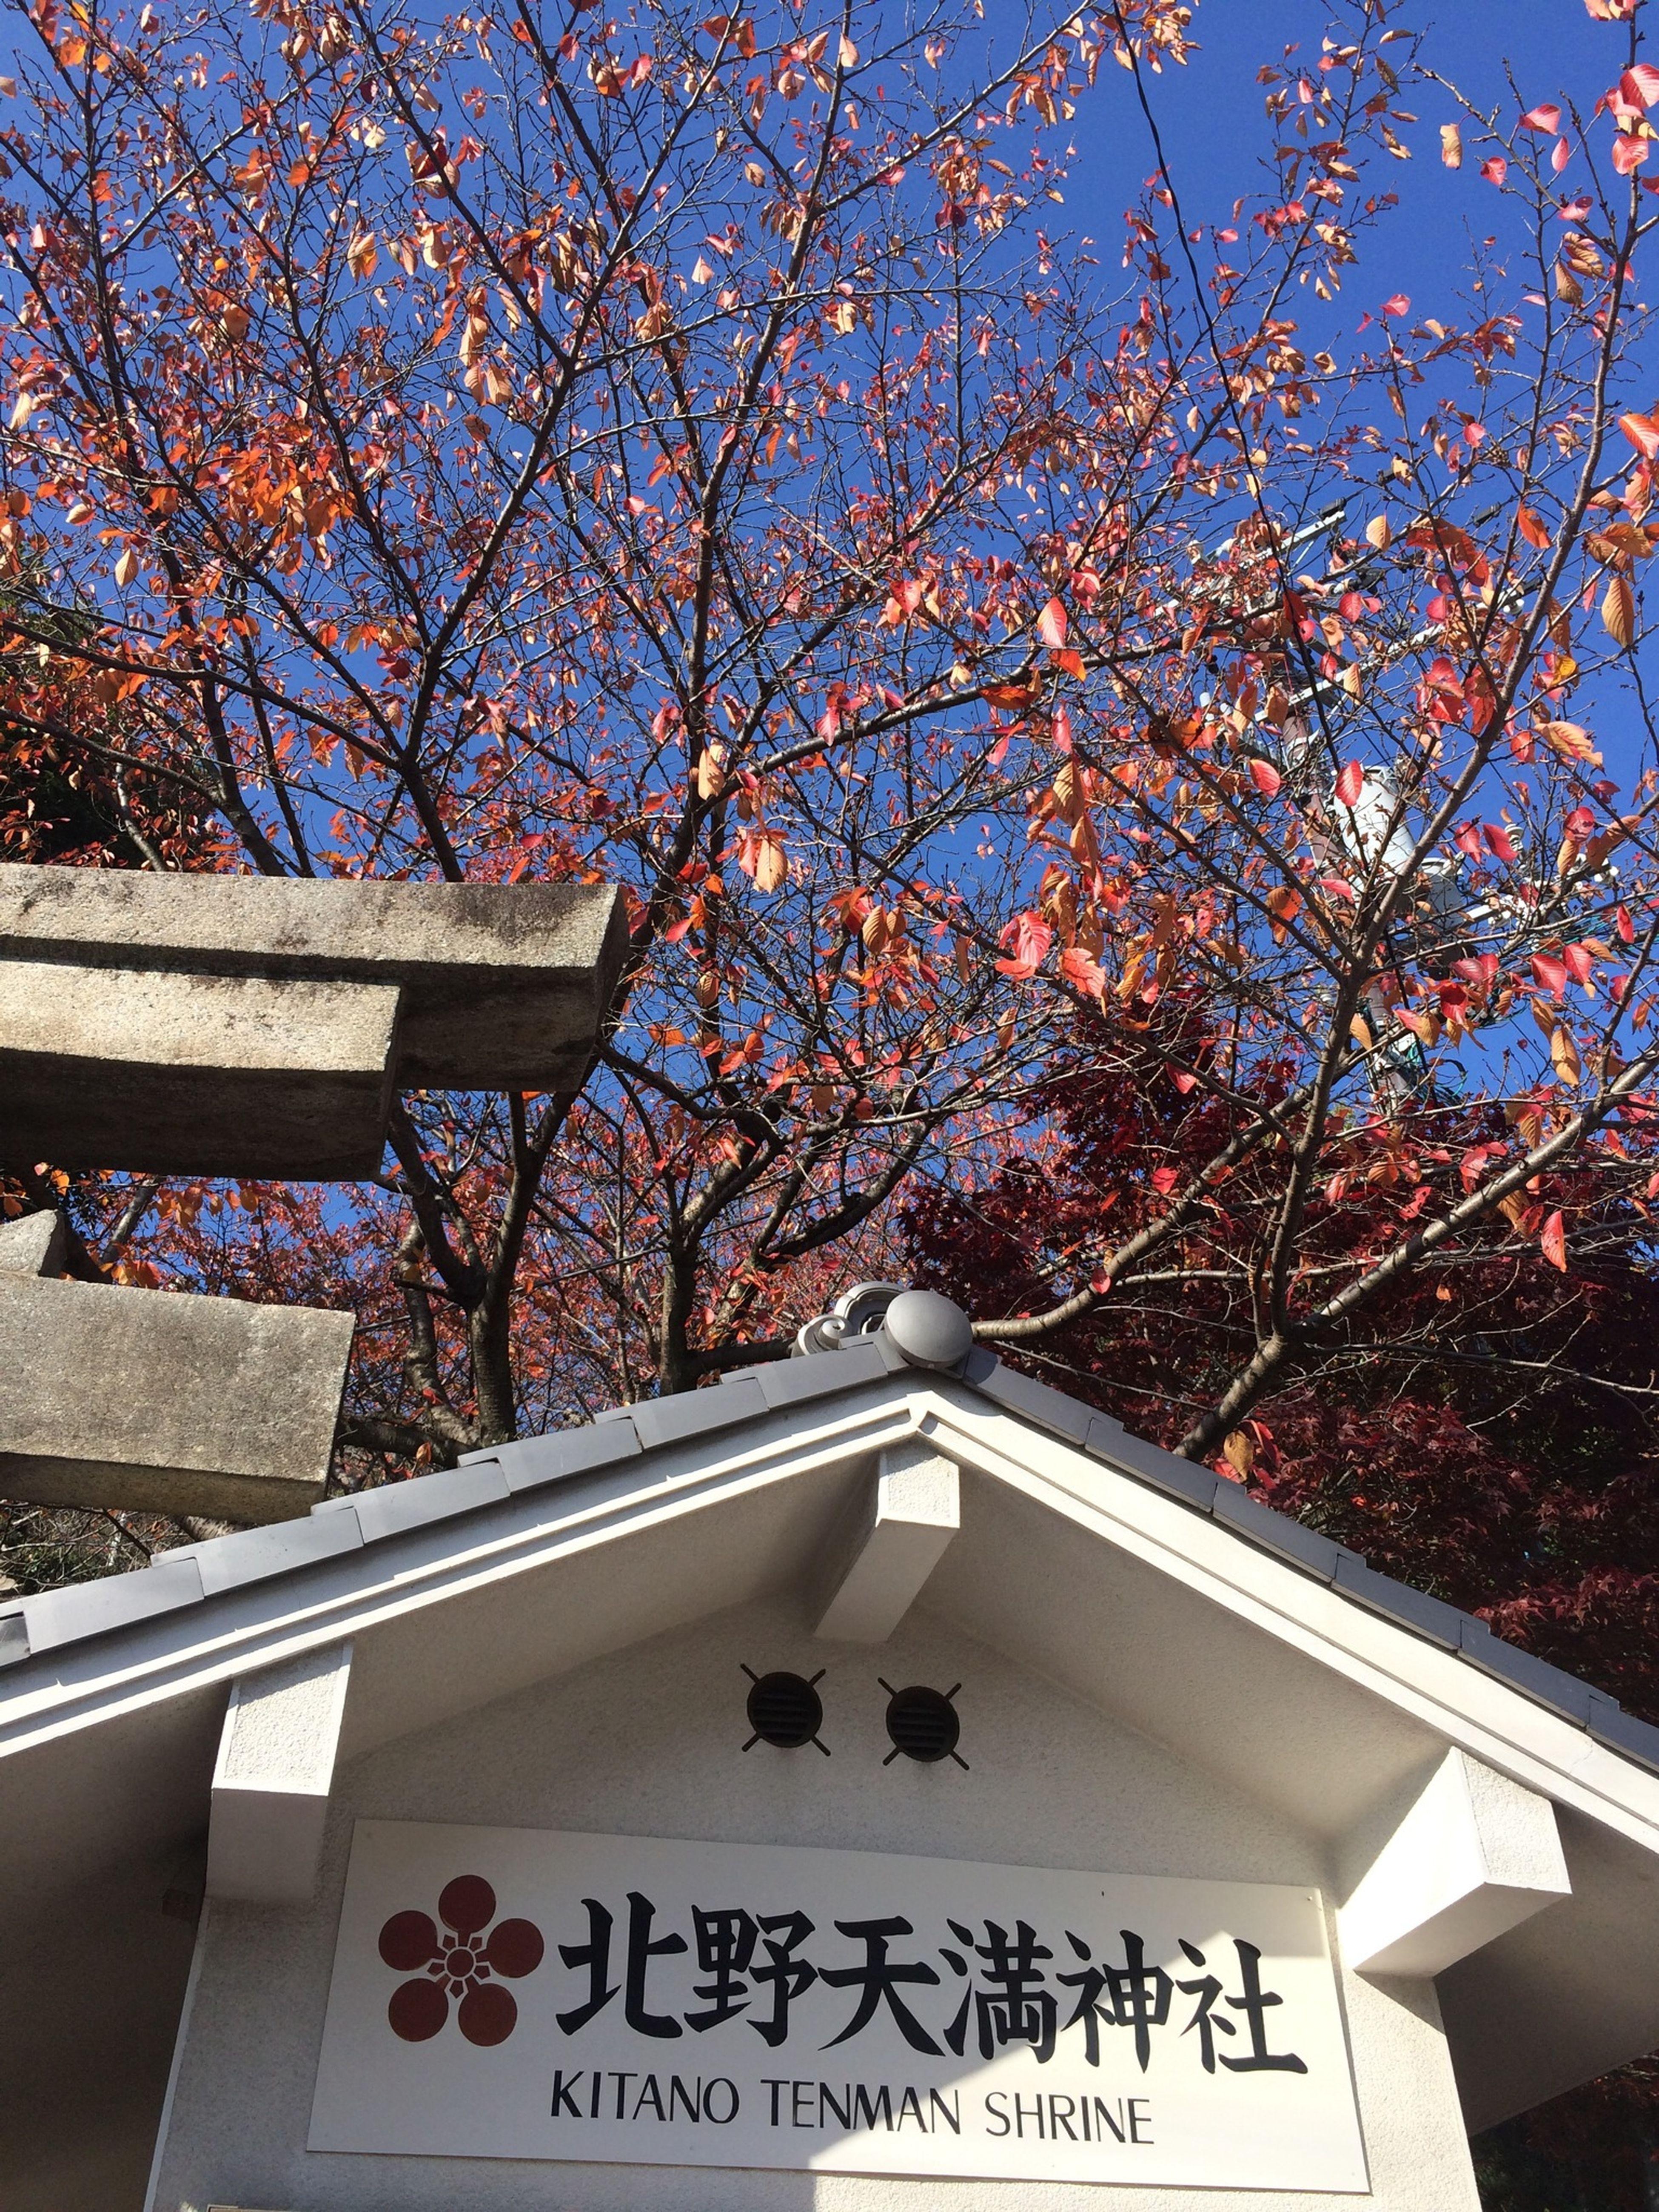 Kitano-cho Bistrotcafedeparis Kitty Temple Kitanocafe (null)